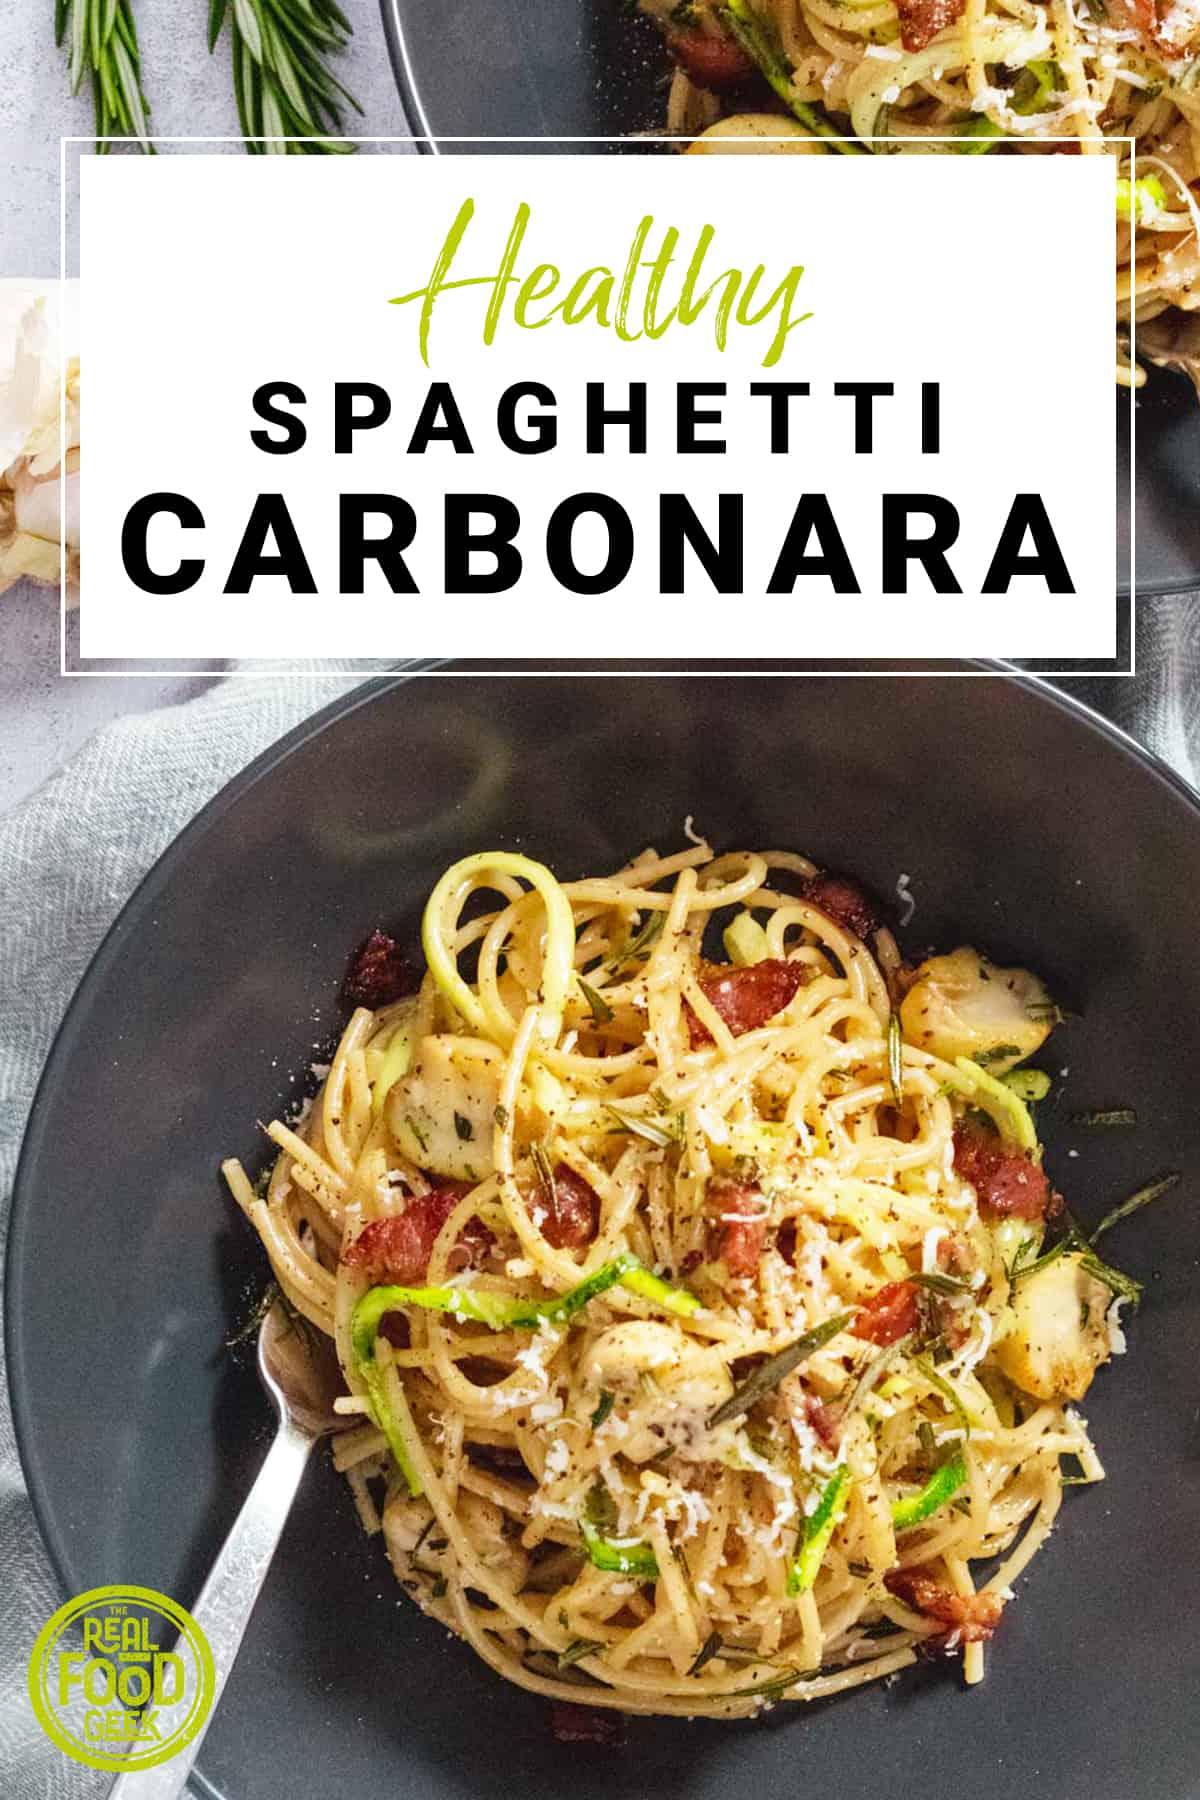 Bowl of healthy spaghetti carbonara in black pasta bowl